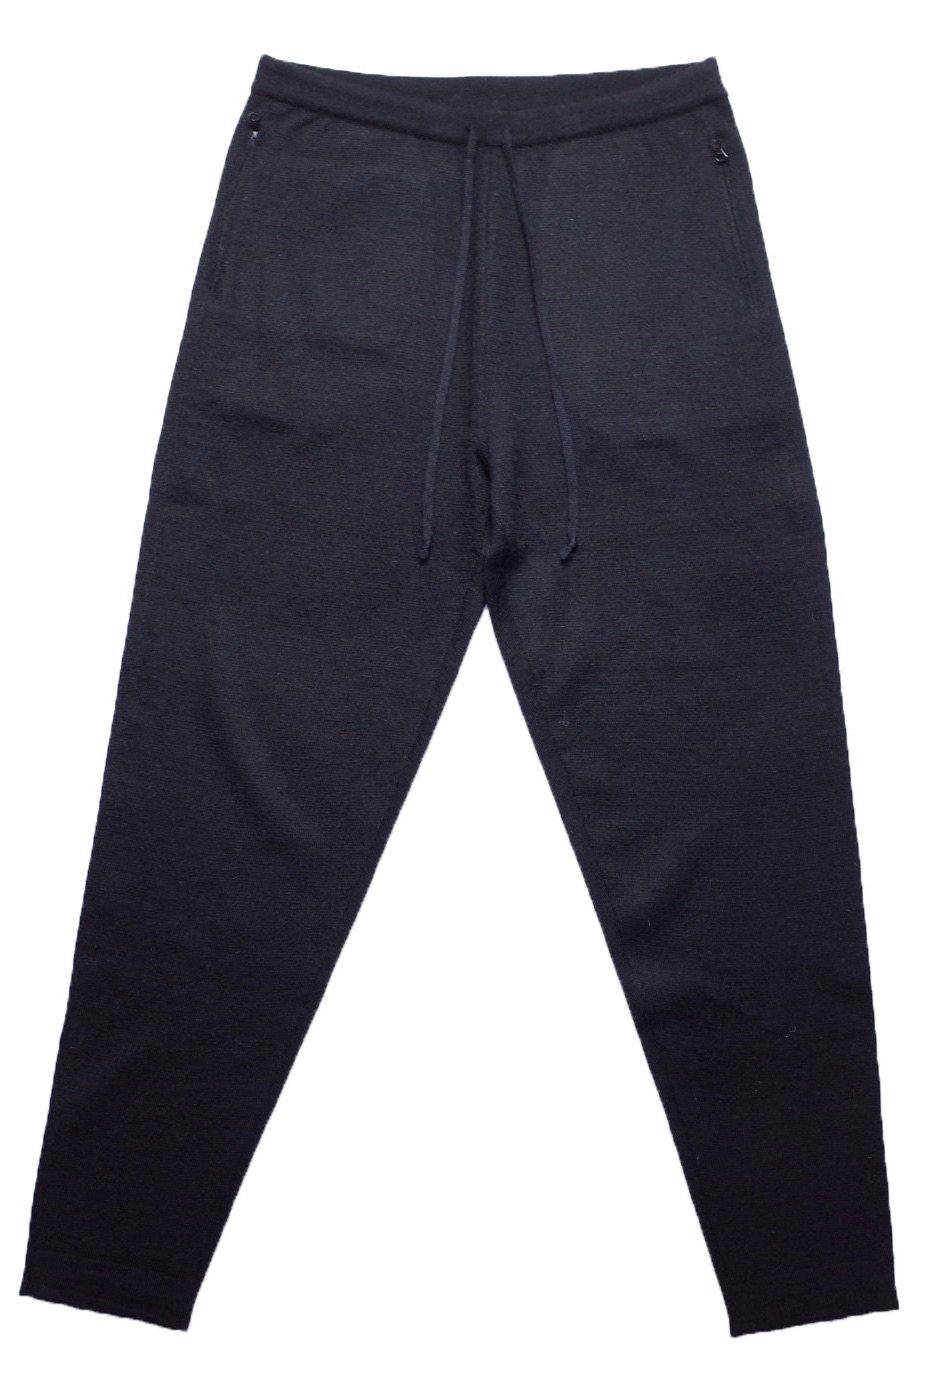 THE INOUE BROTHERS...ザ イノウエブラザーズ-High Gauge Knit Trousers/BLACK-men's